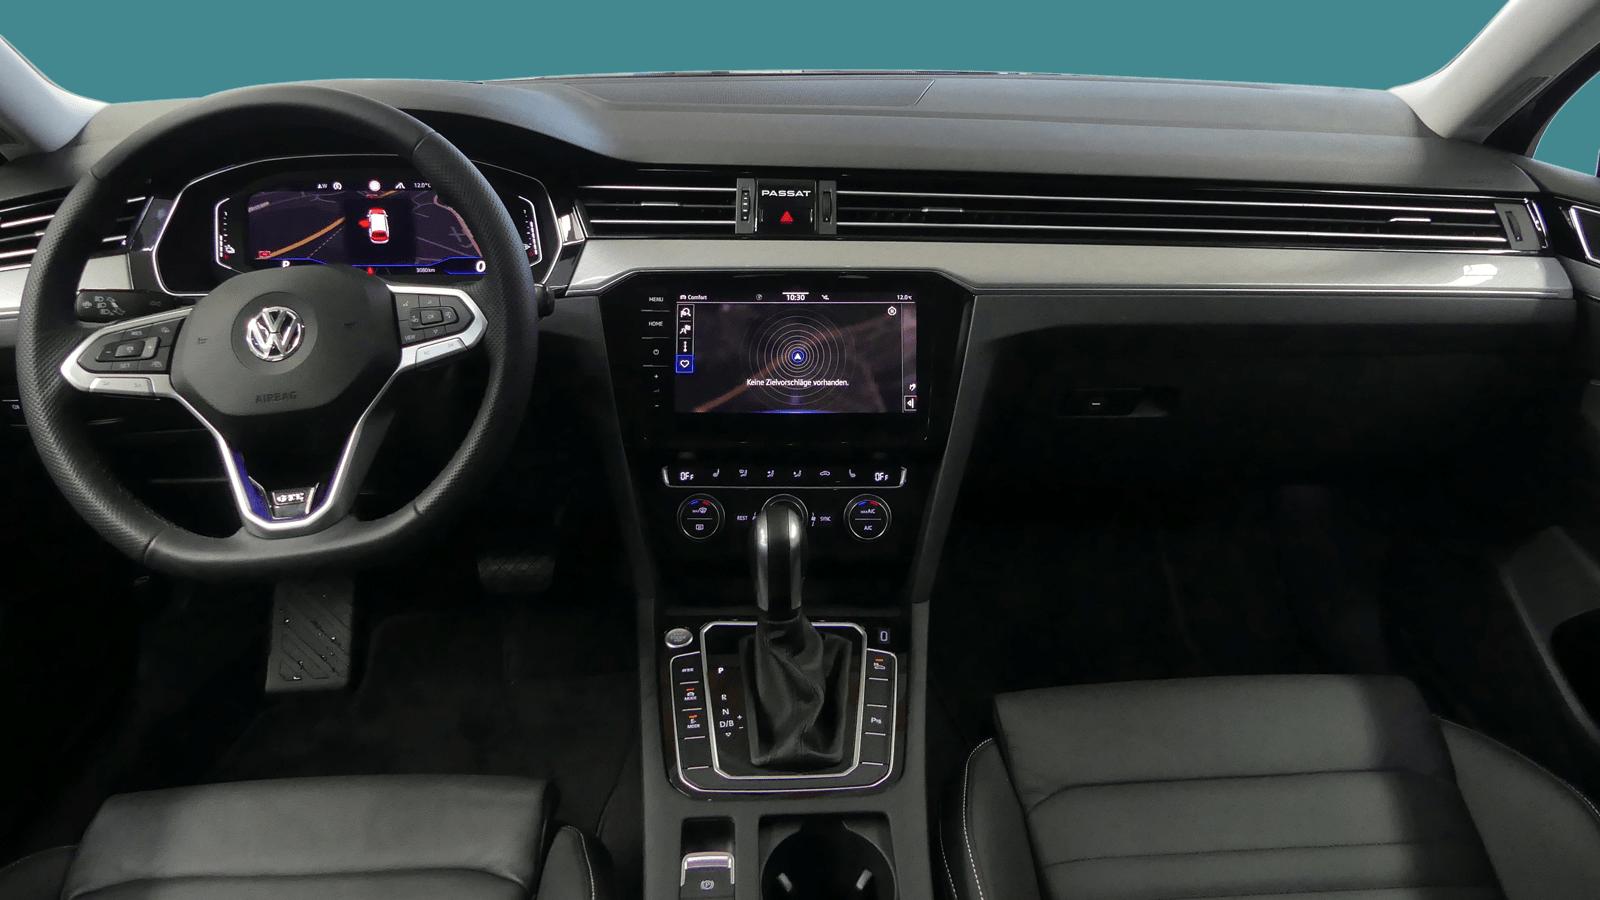 VW Passat Variant Black interior - Clyde car subscription